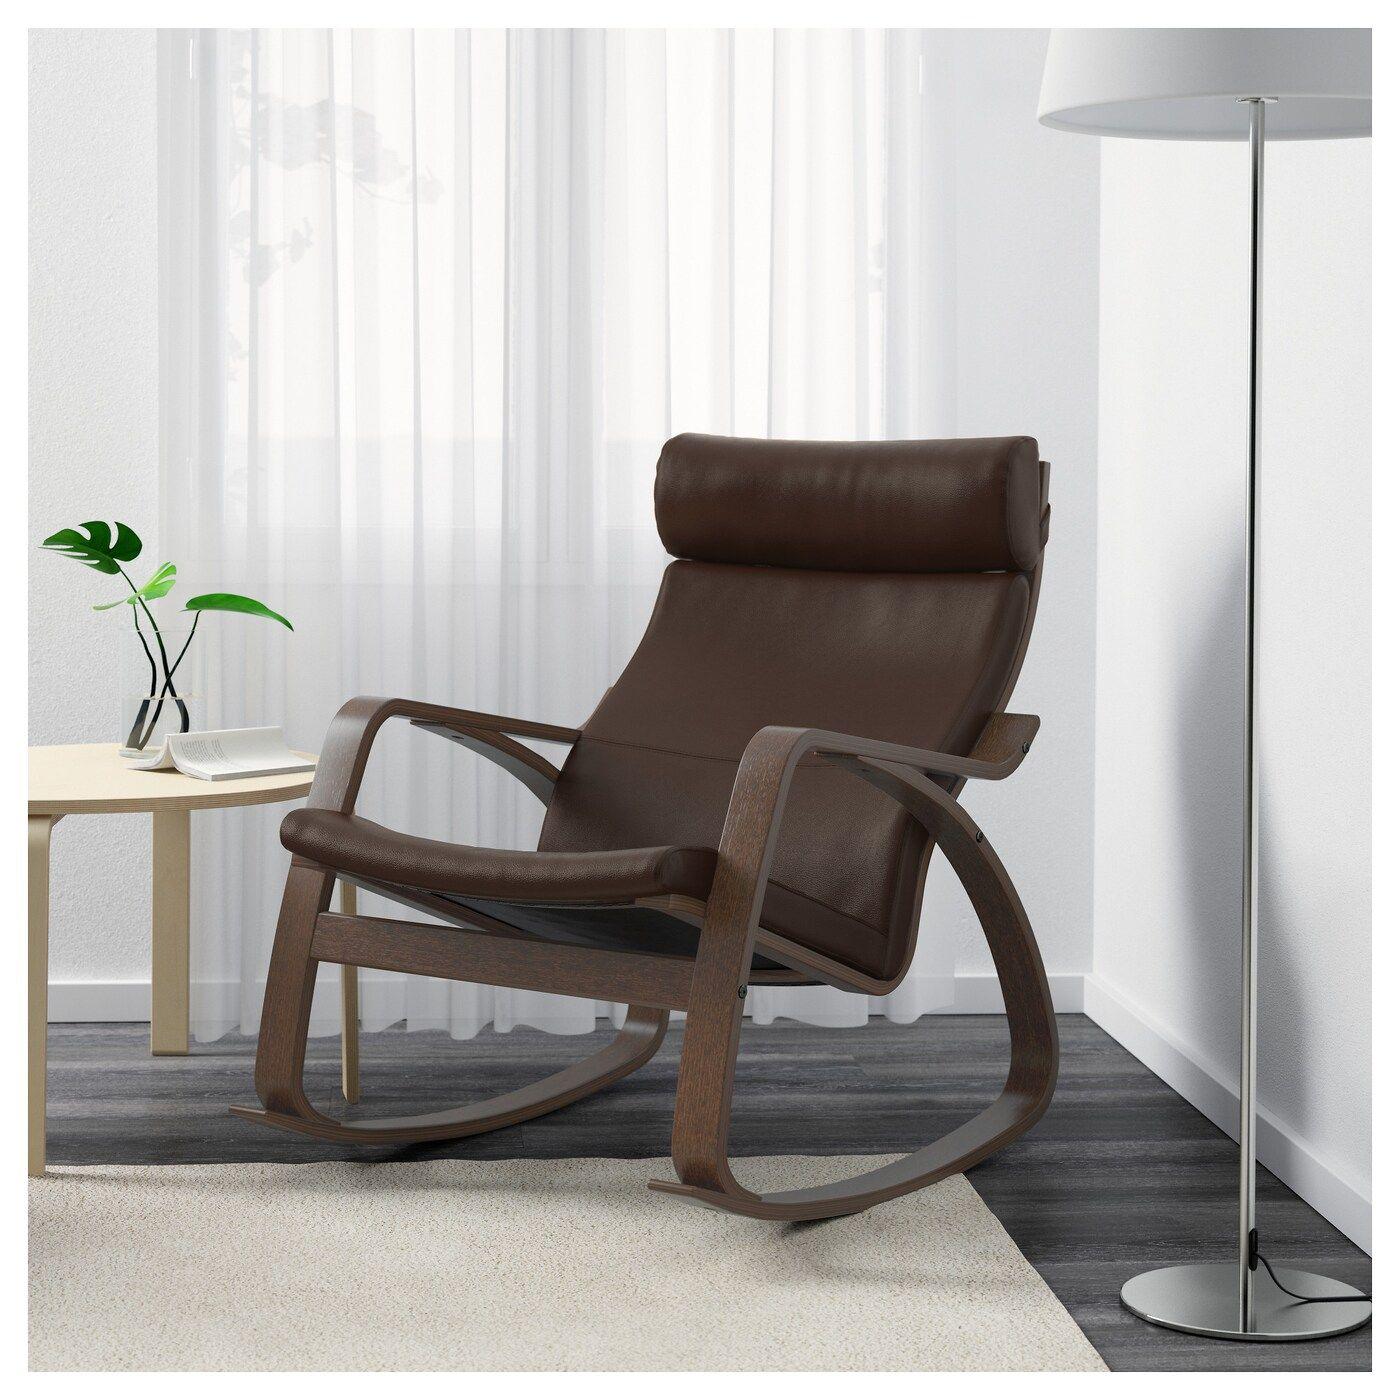 Ikea Poang Rocking Chair Brown Glose Dark Brown Fauteuil A Bascule Fauteuil Et Chaise A Bascule